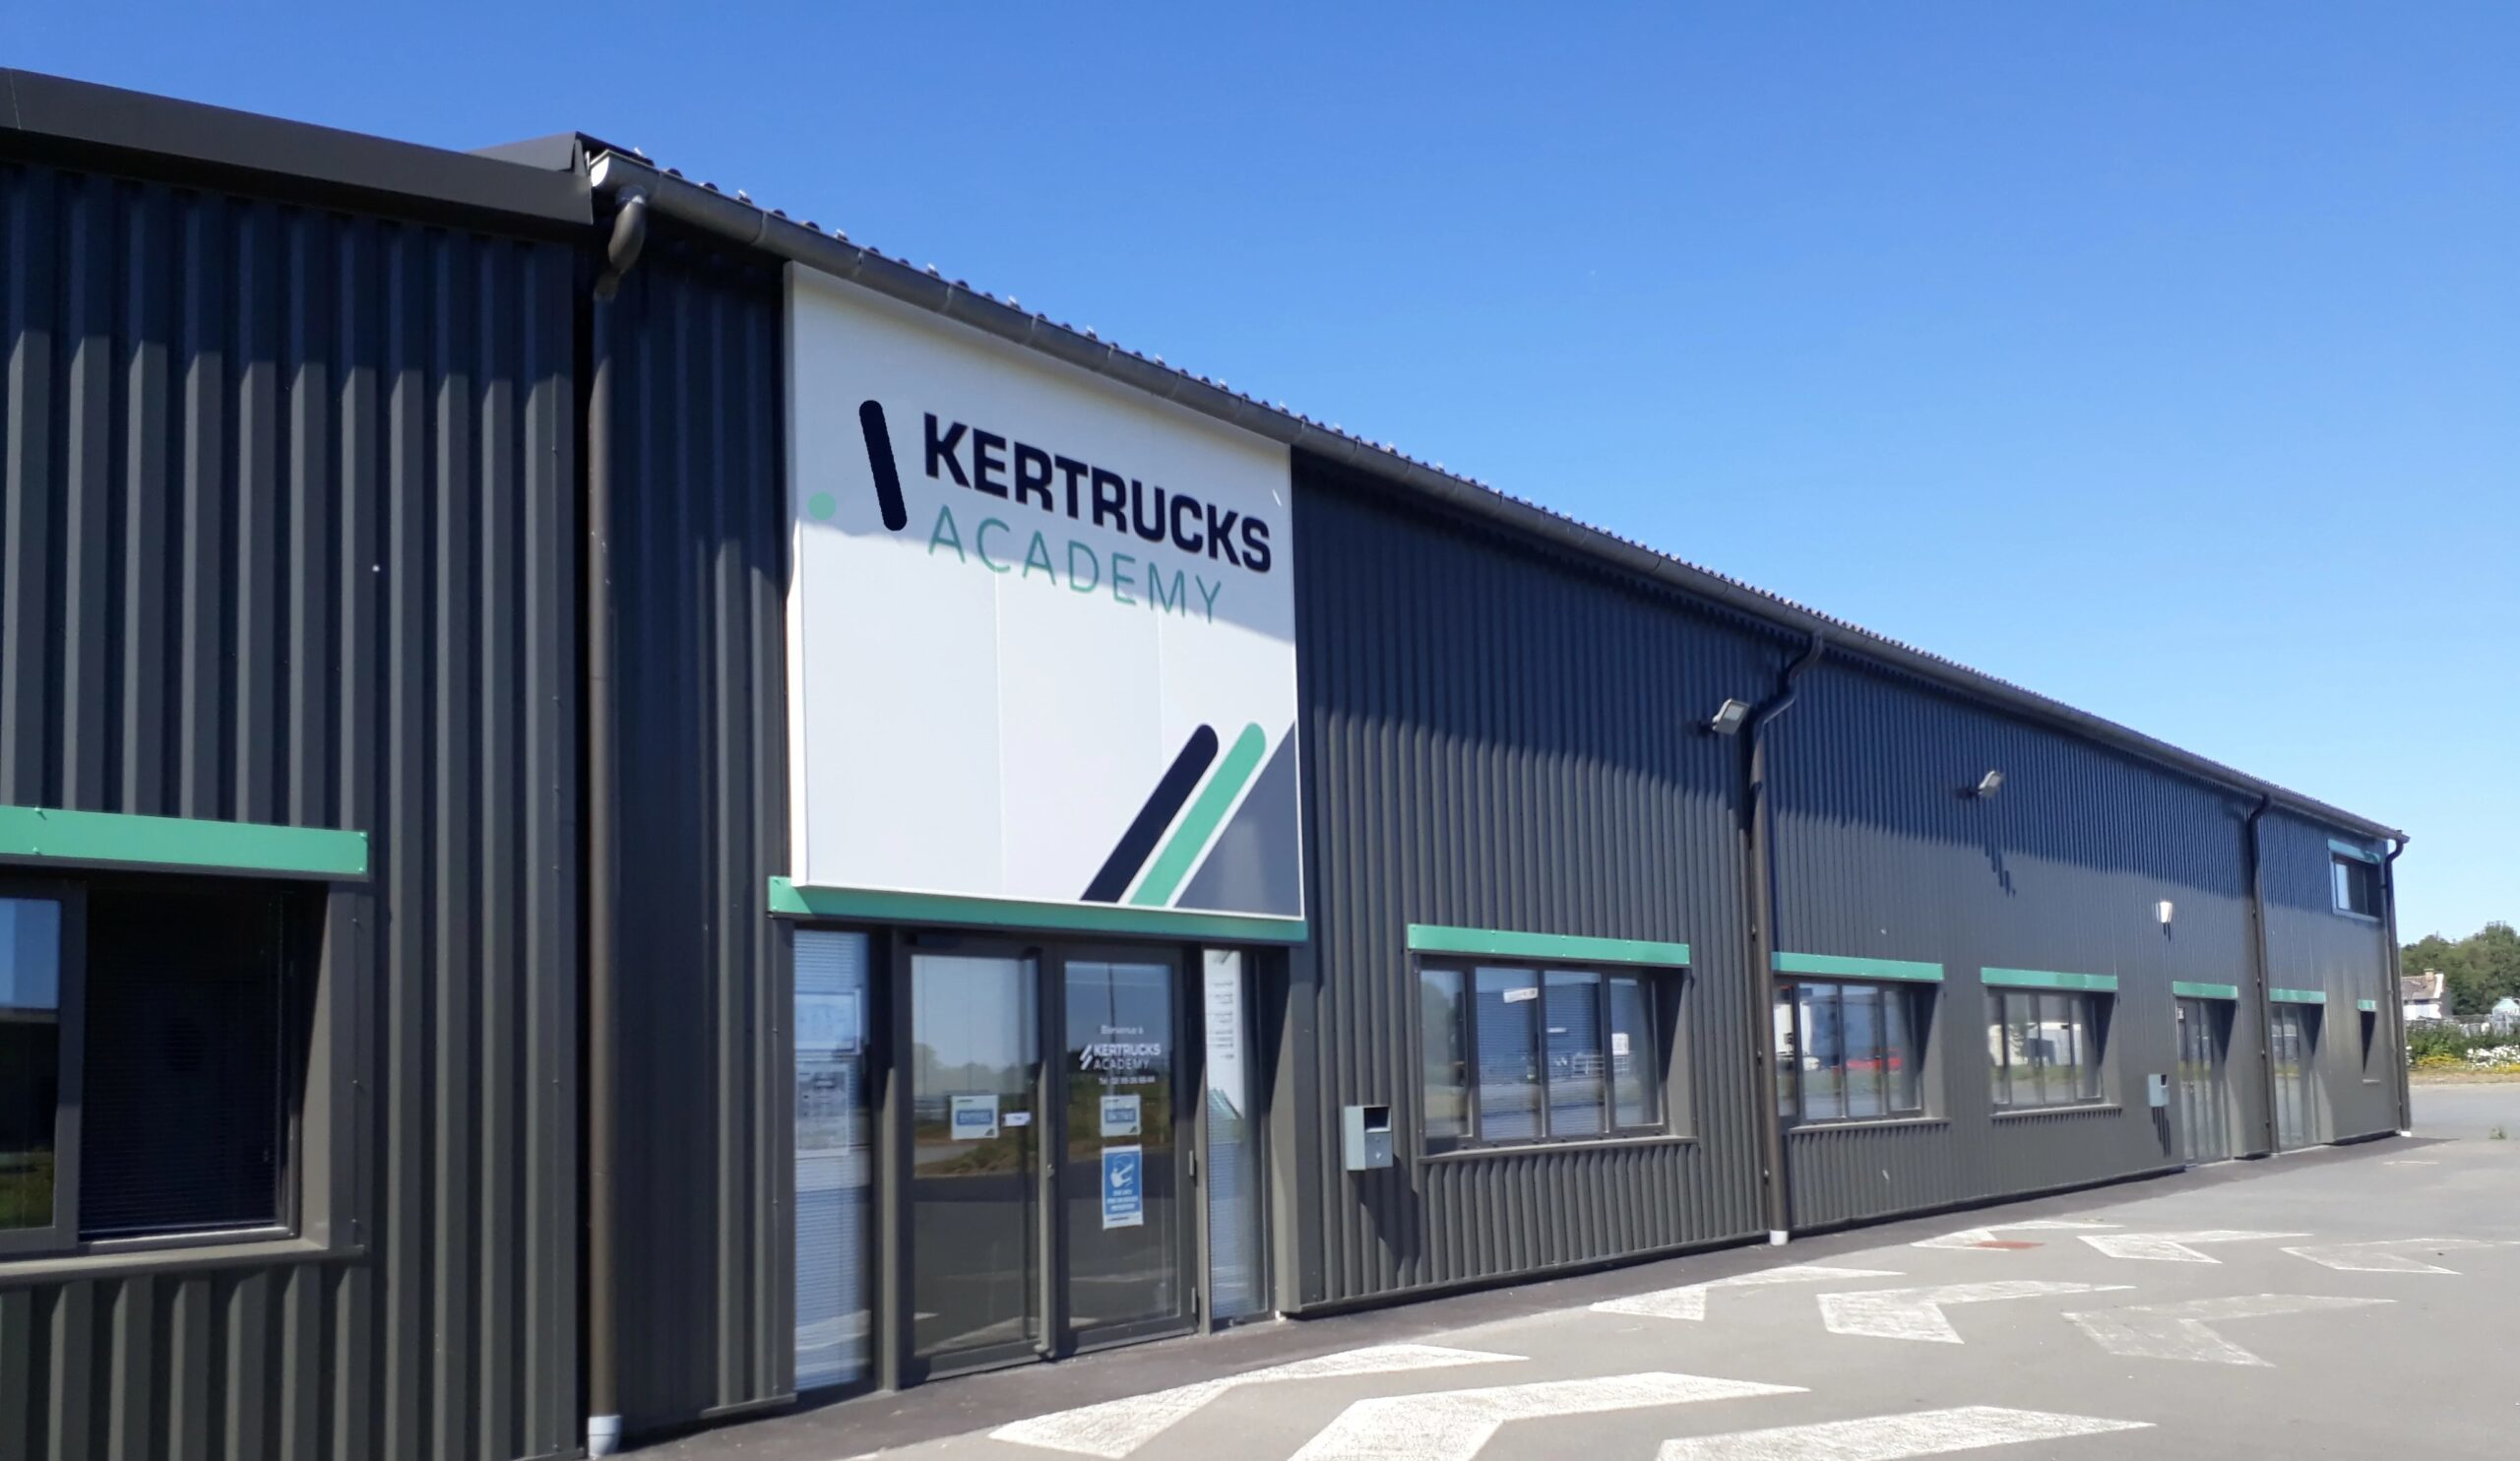 Exterieur Kertrucks academy